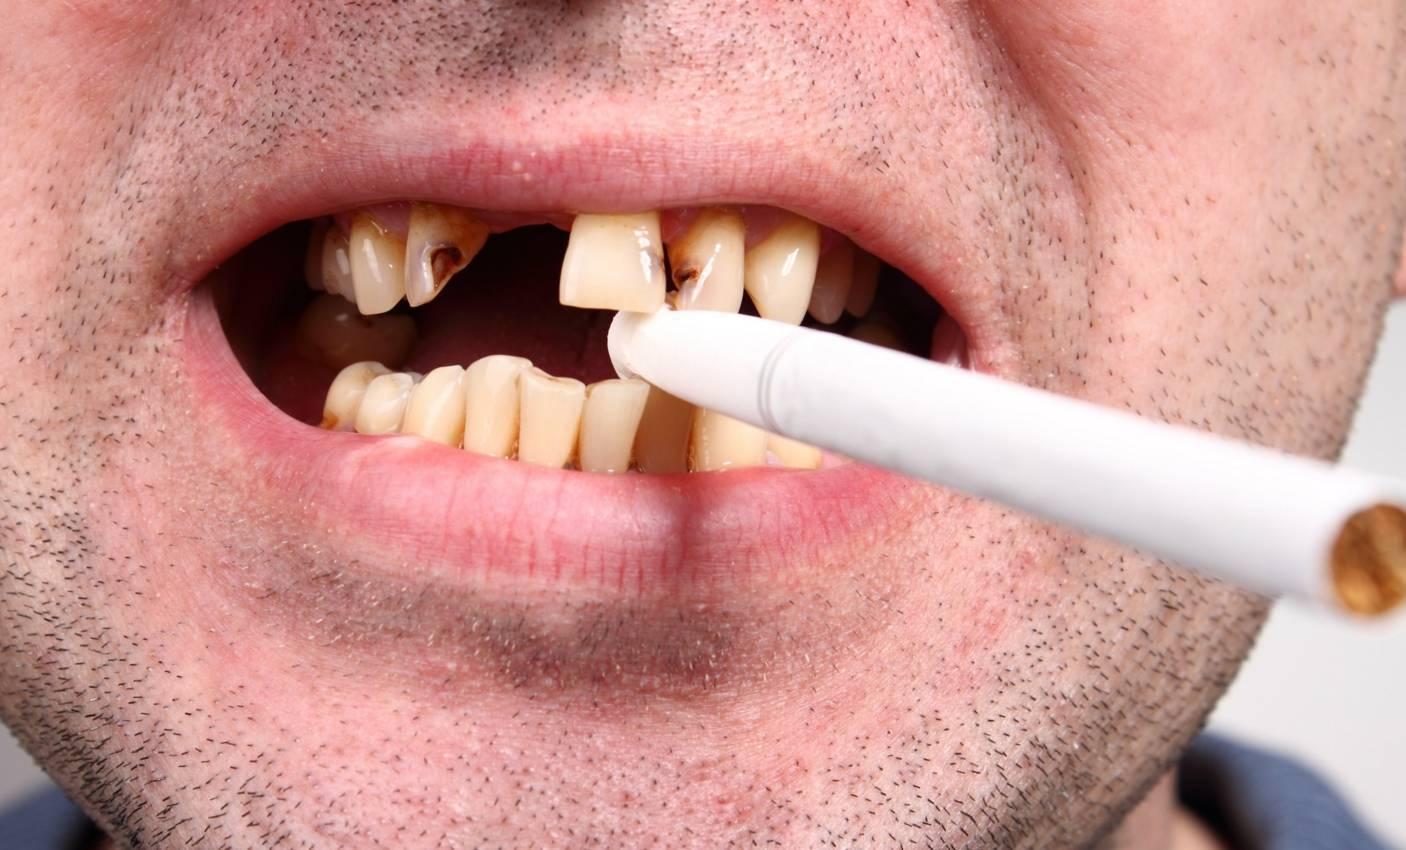 Отзыв курильщика об iqos: желтеют ли зубы?